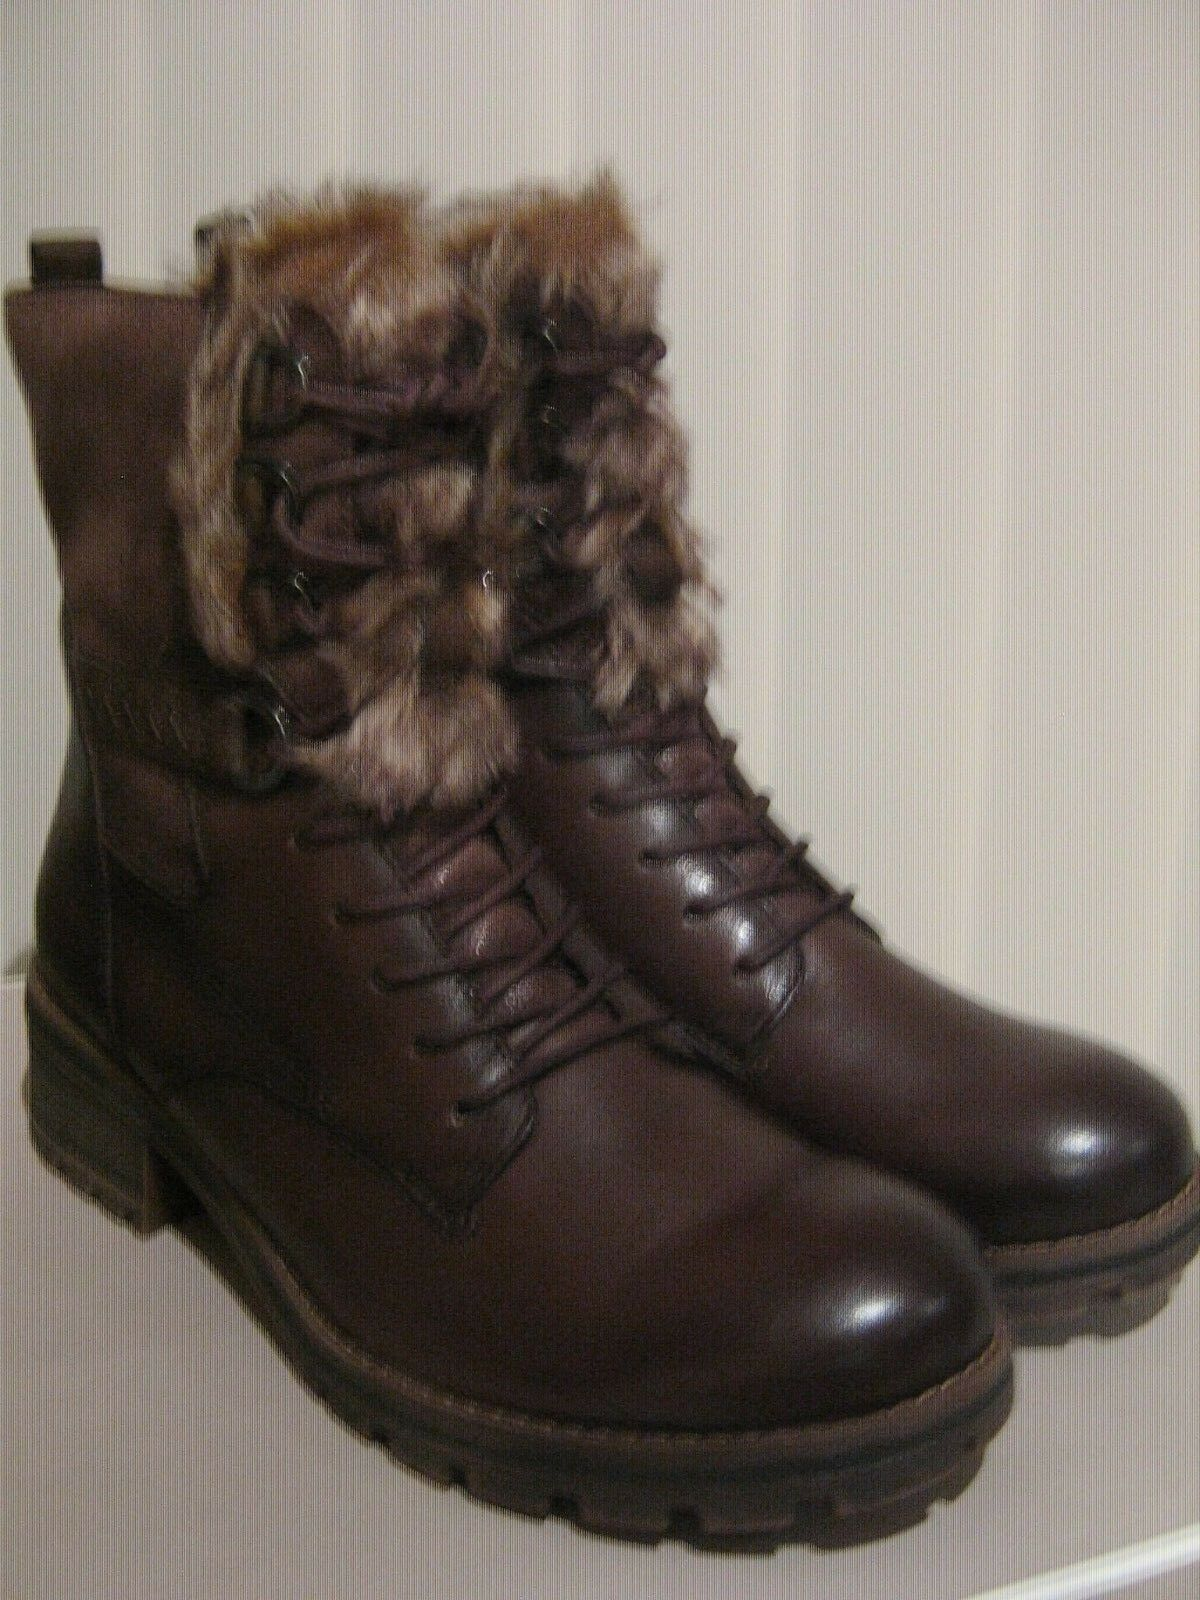 Tamaris Rich braun Leather Textile 9 Eye Lace + Zip mode Stiefel Warm Lining